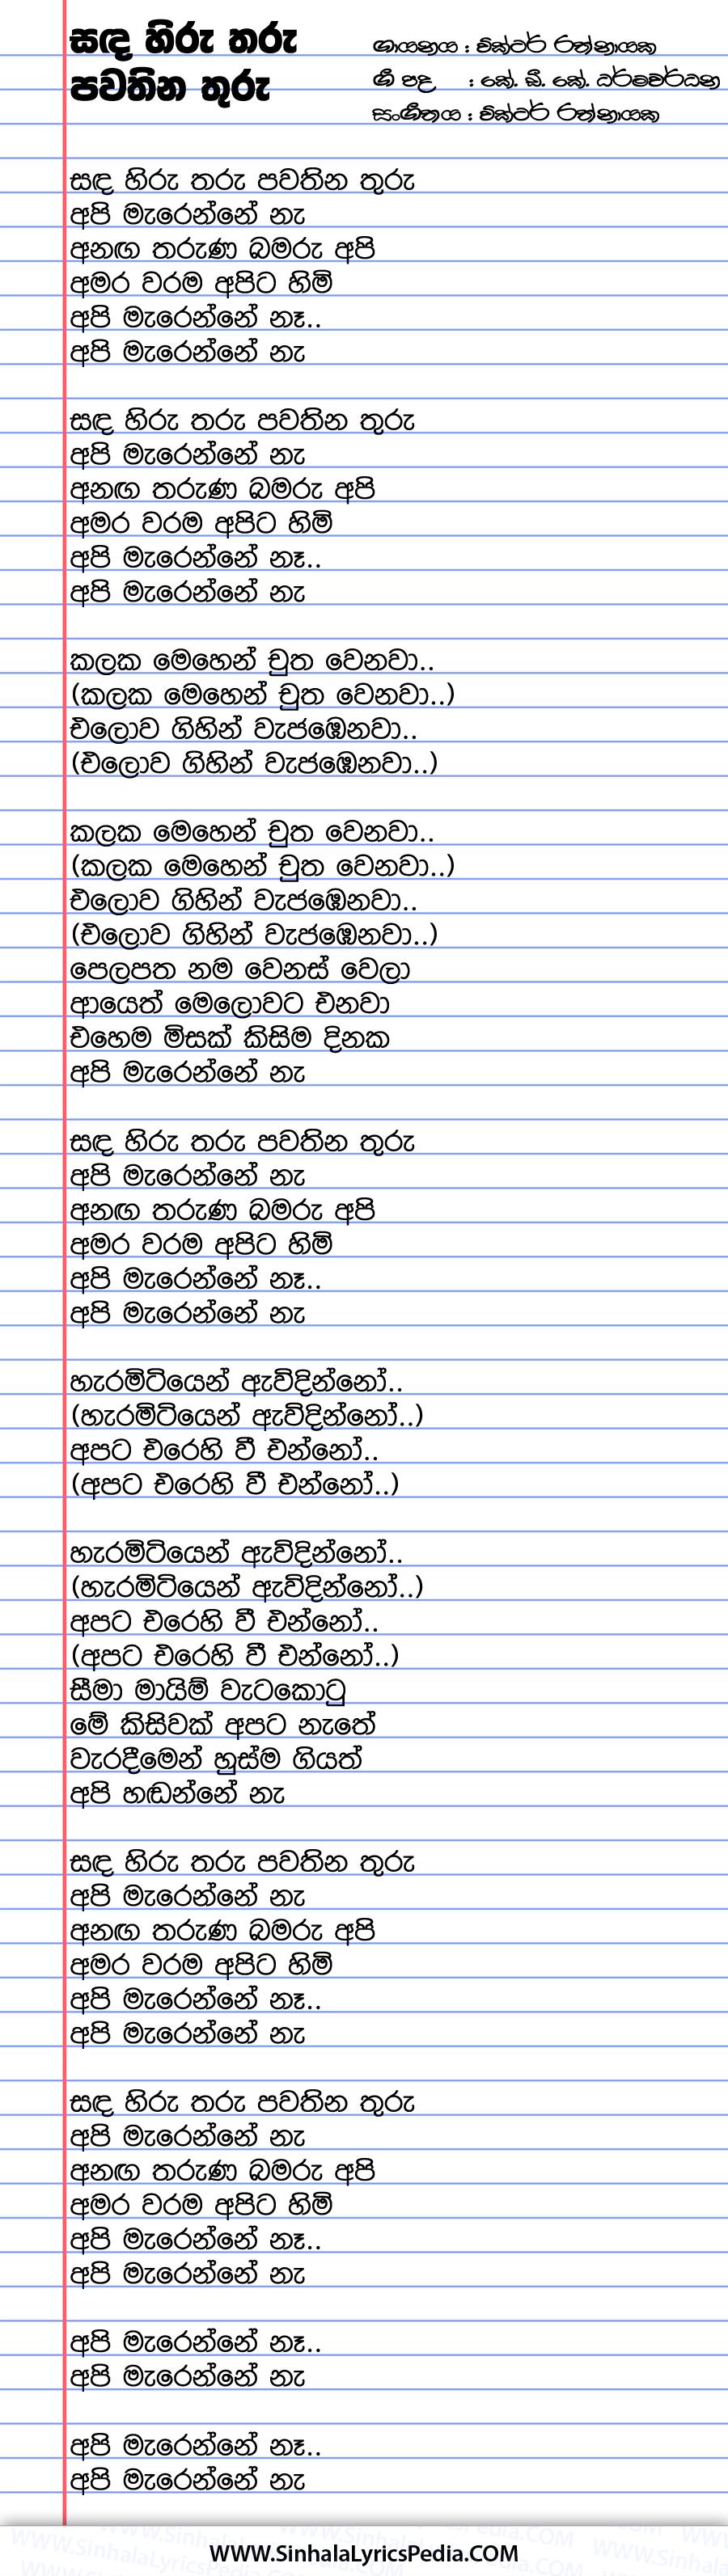 Sanda Hiru Tharu Pawathina Thuru Song Lyrics